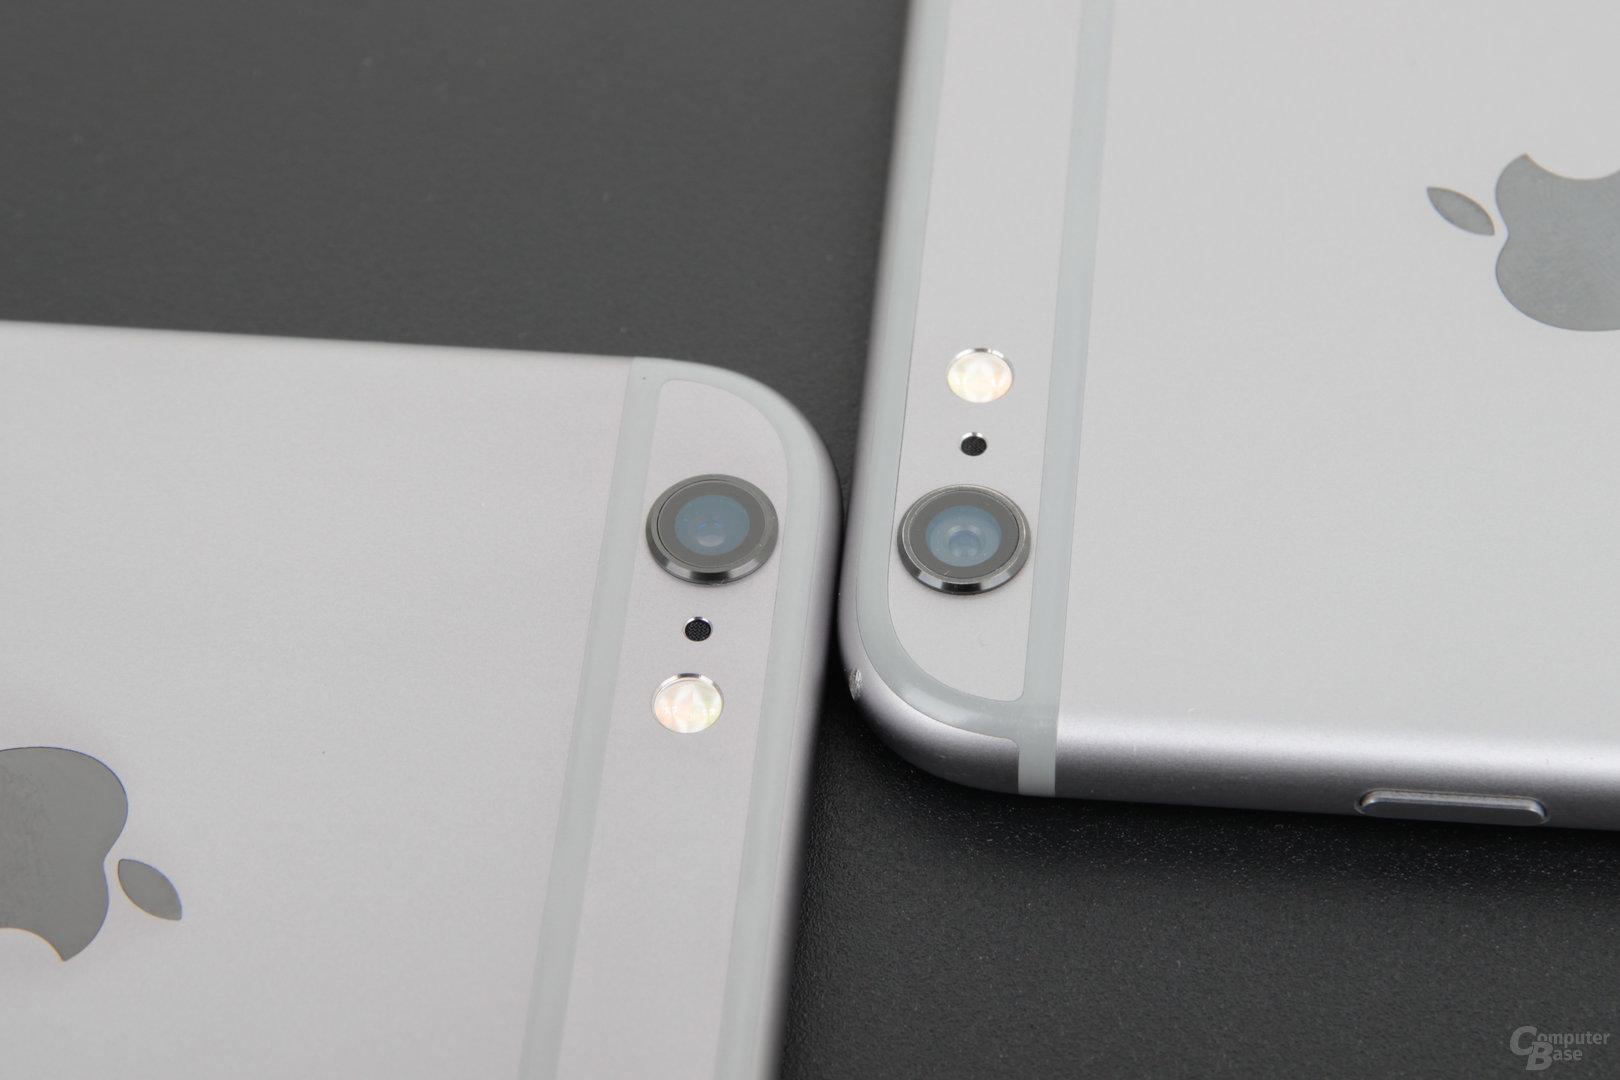 Kamera des Apple iPhone 6s Plus (links) und iPhone 6 Plus (rechts)